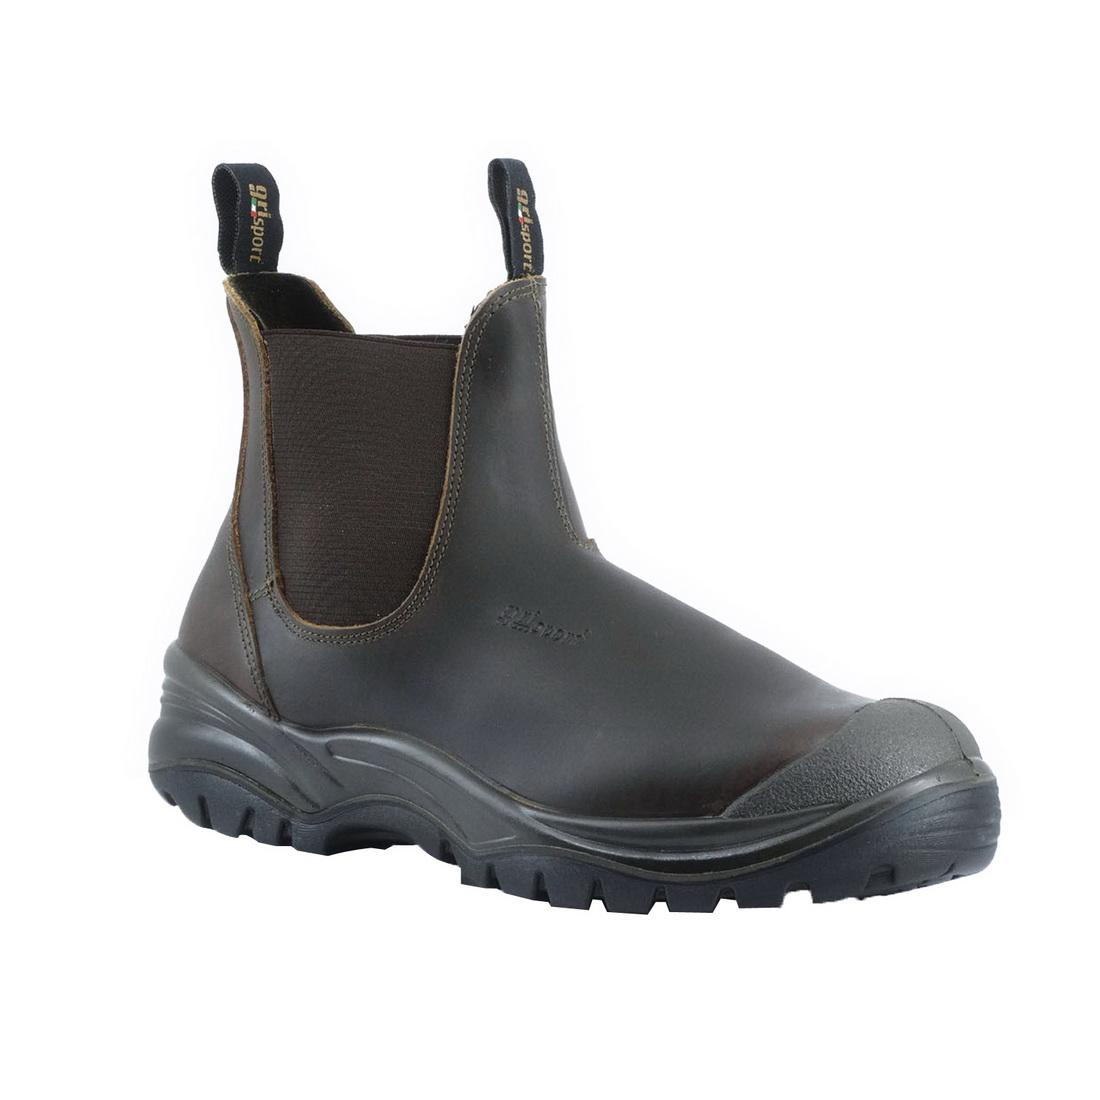 Genoa Safety Slip On Safety Boot Size 10 Brown Dakar Leather